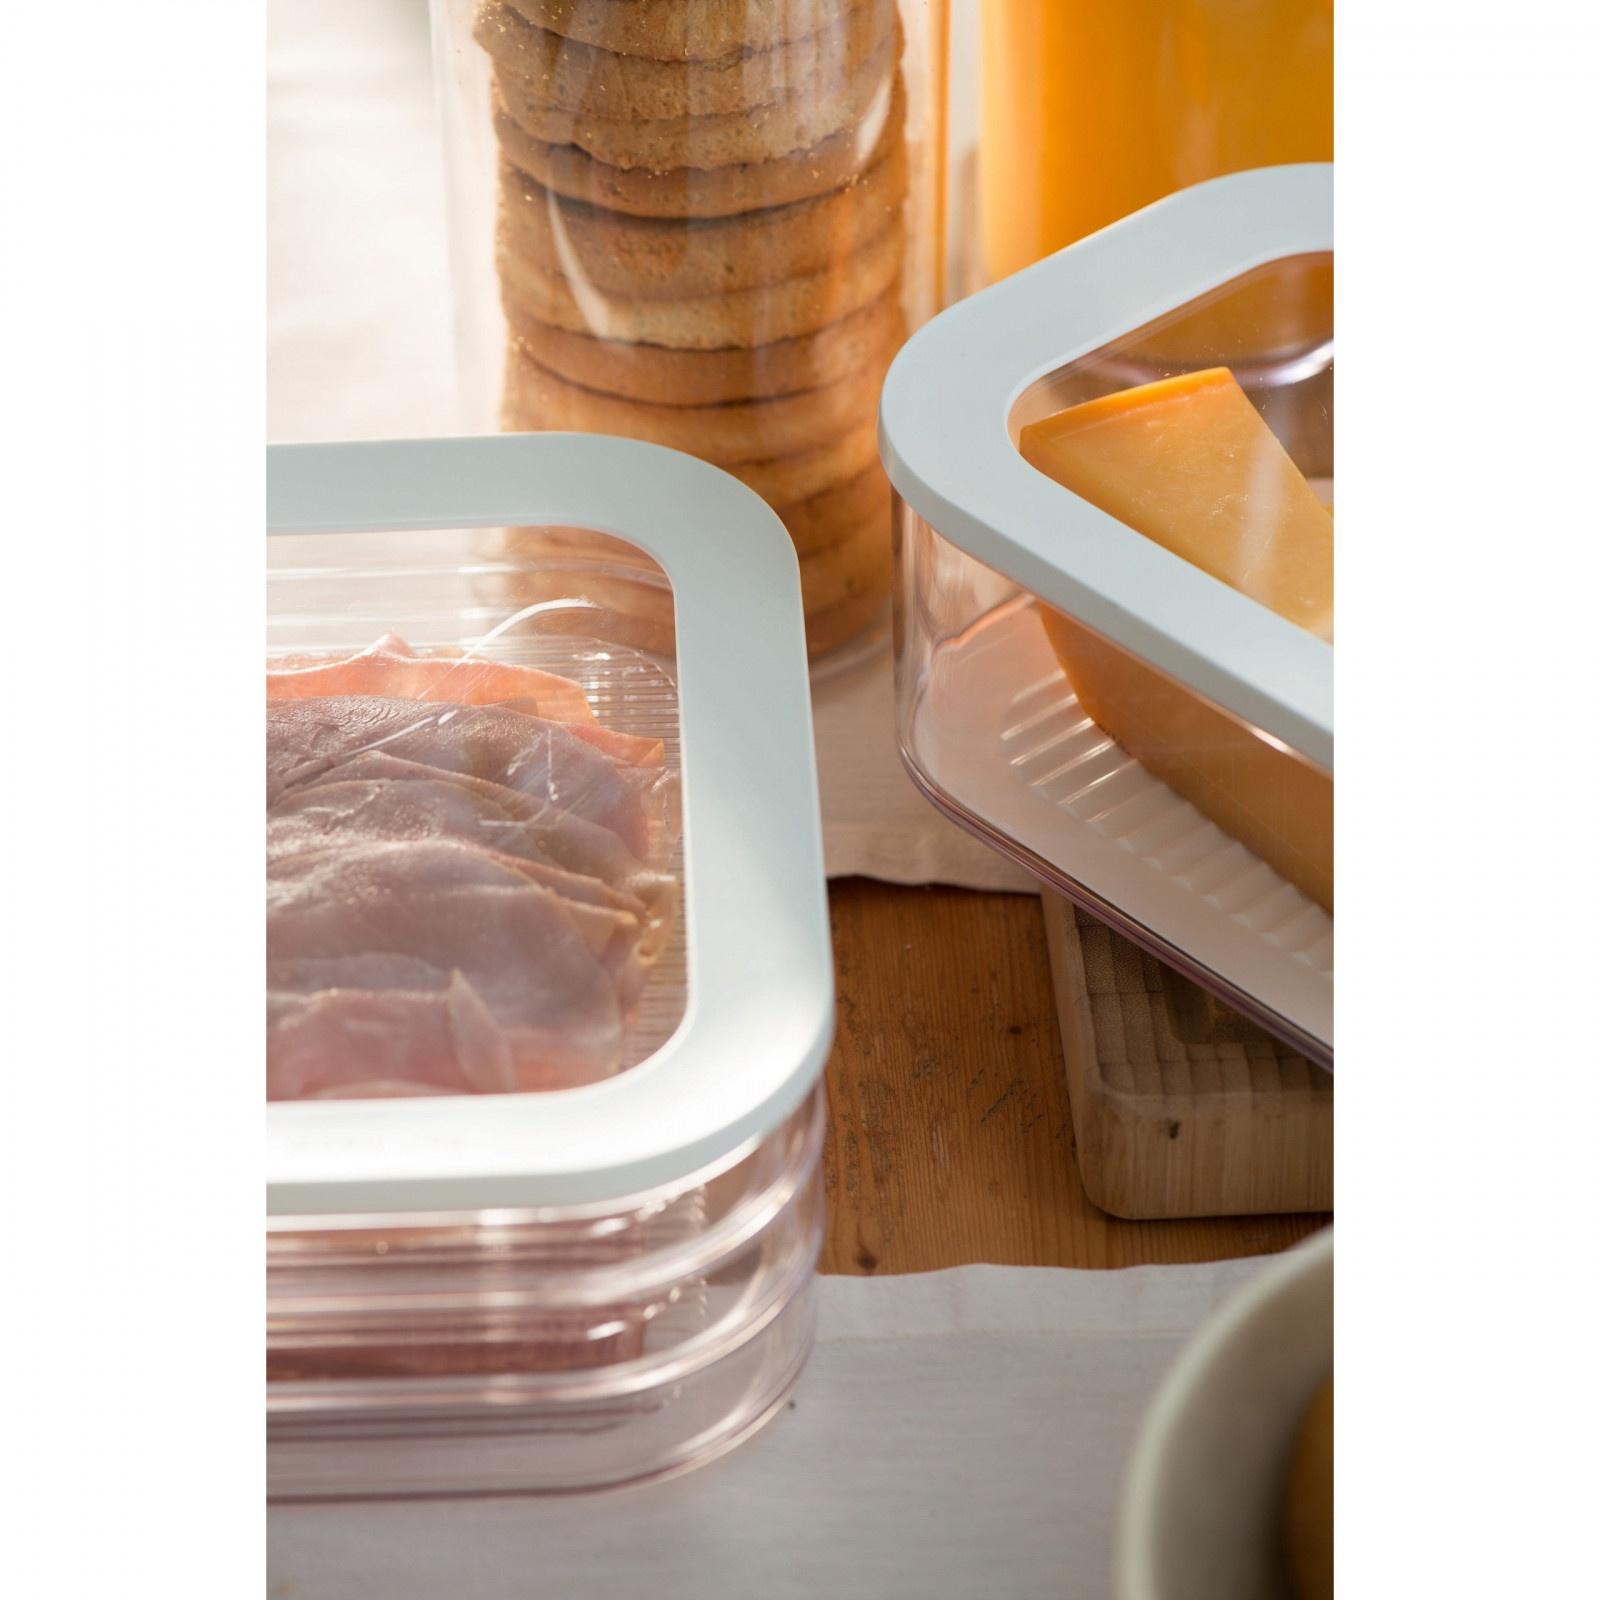 nádoba na potraviny mäso zeleninu 3 poschodia 16x8x22cm megamix.sk